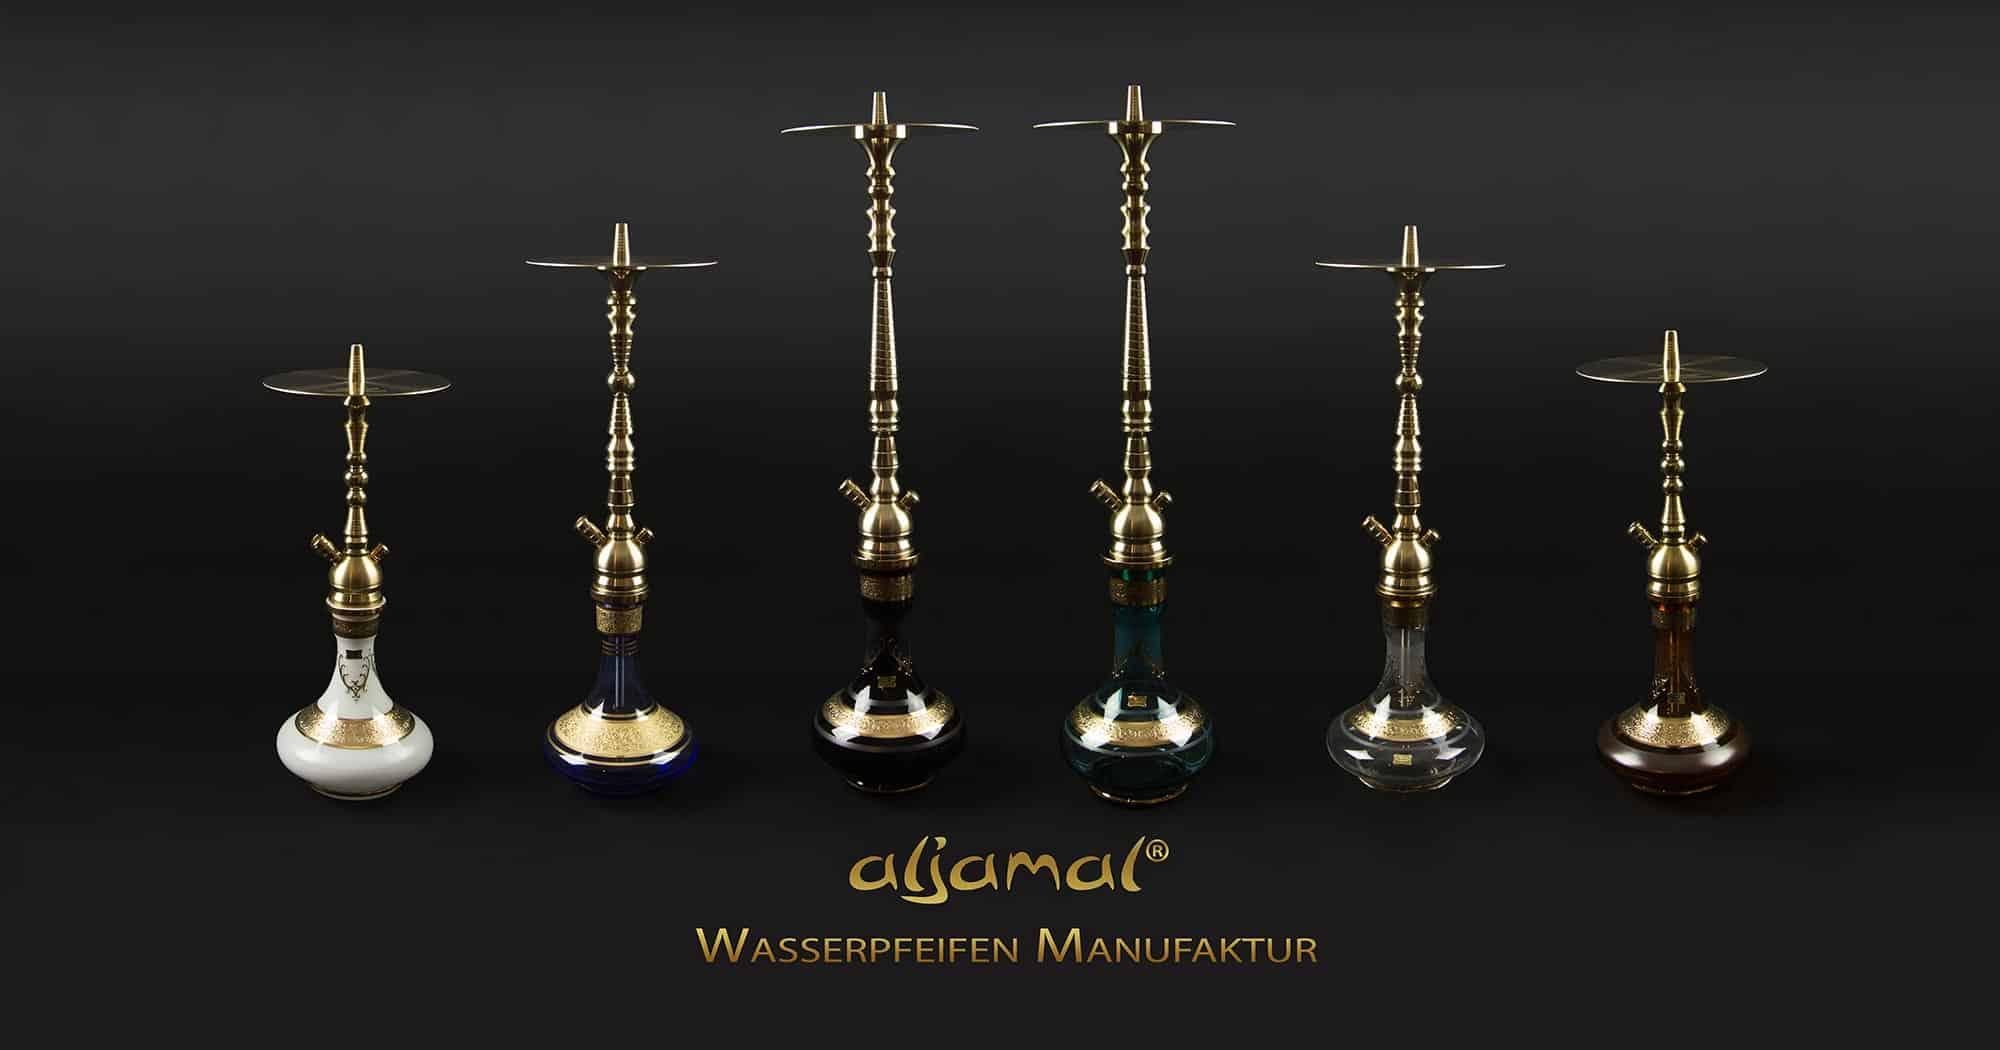 aljamal Wasserpfeifen